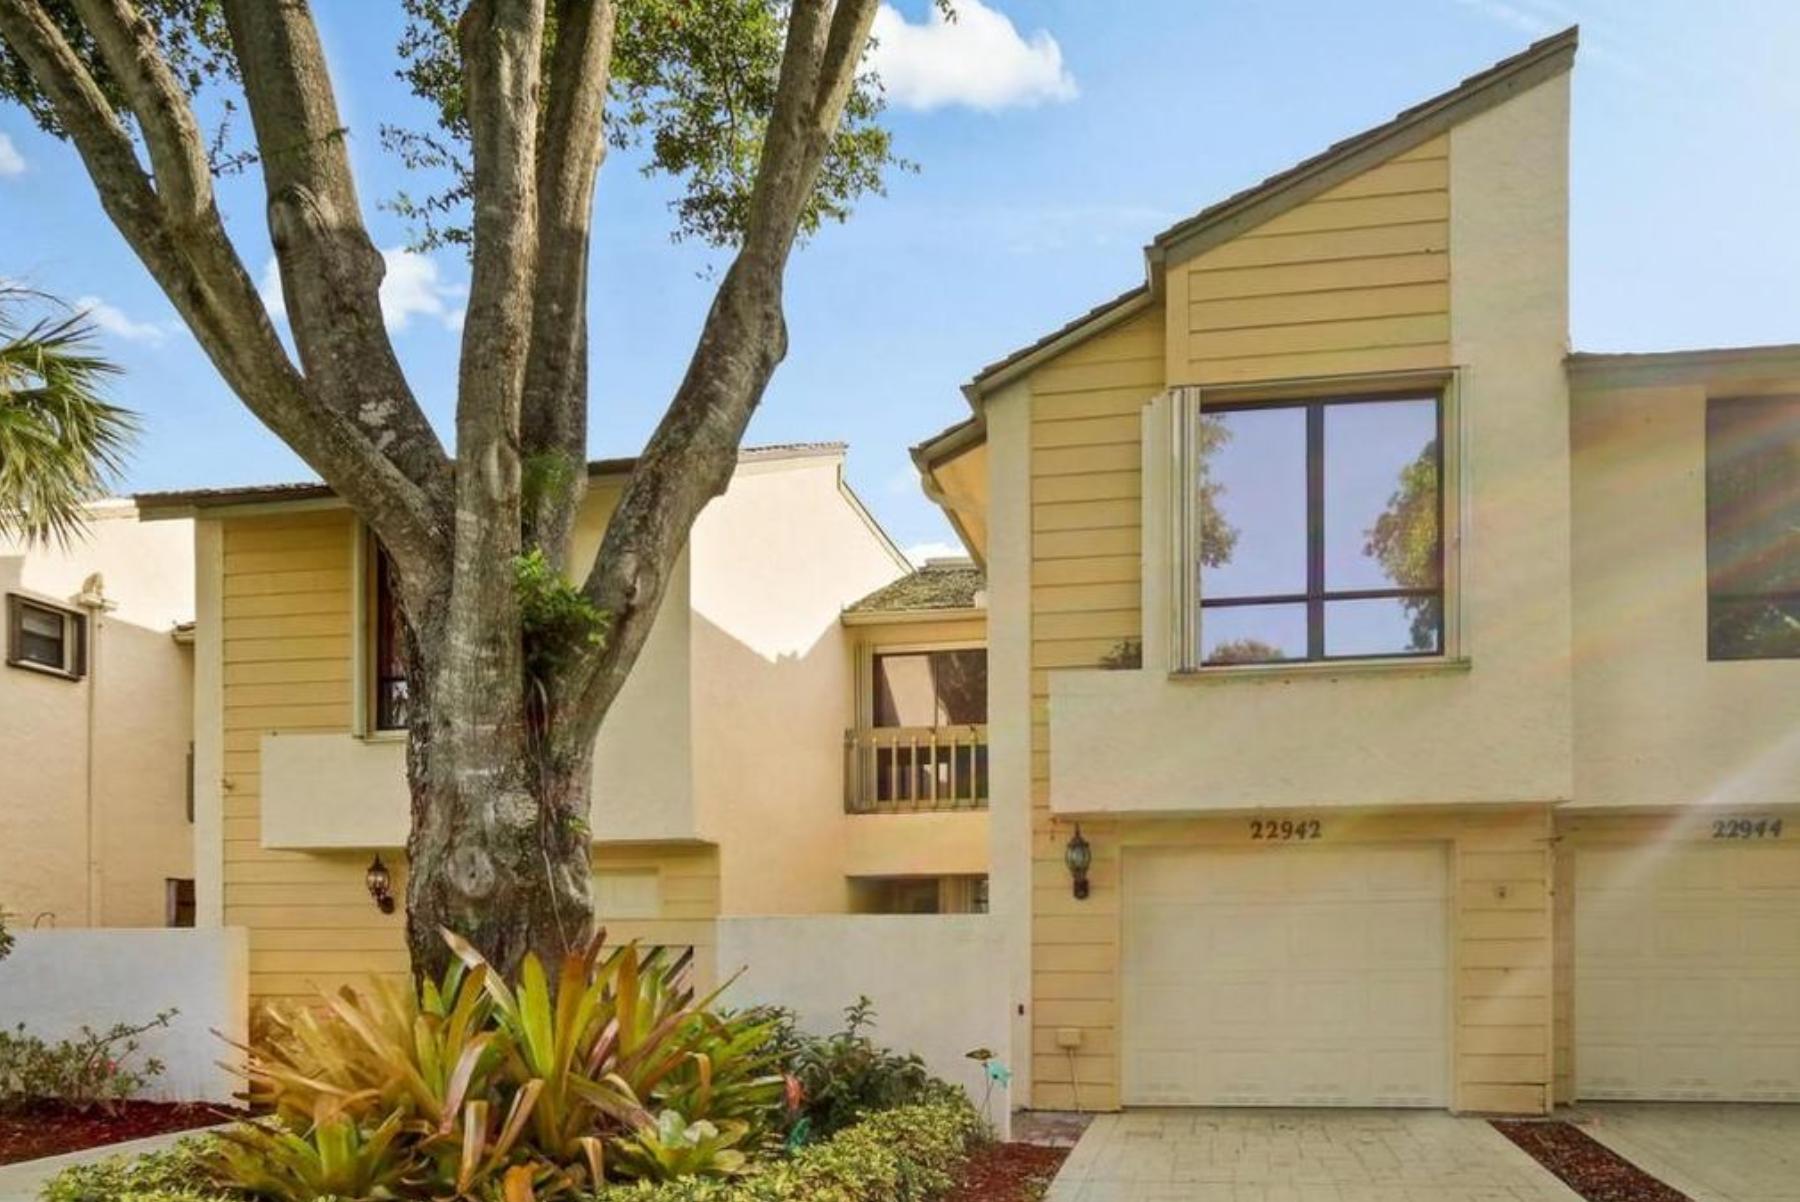 Boca Raton, Florida (Miami-Fort Lauderdale-West Palm Beach, FL); list price: $285,000; square footage: 2,078; beds/baths: 3/3